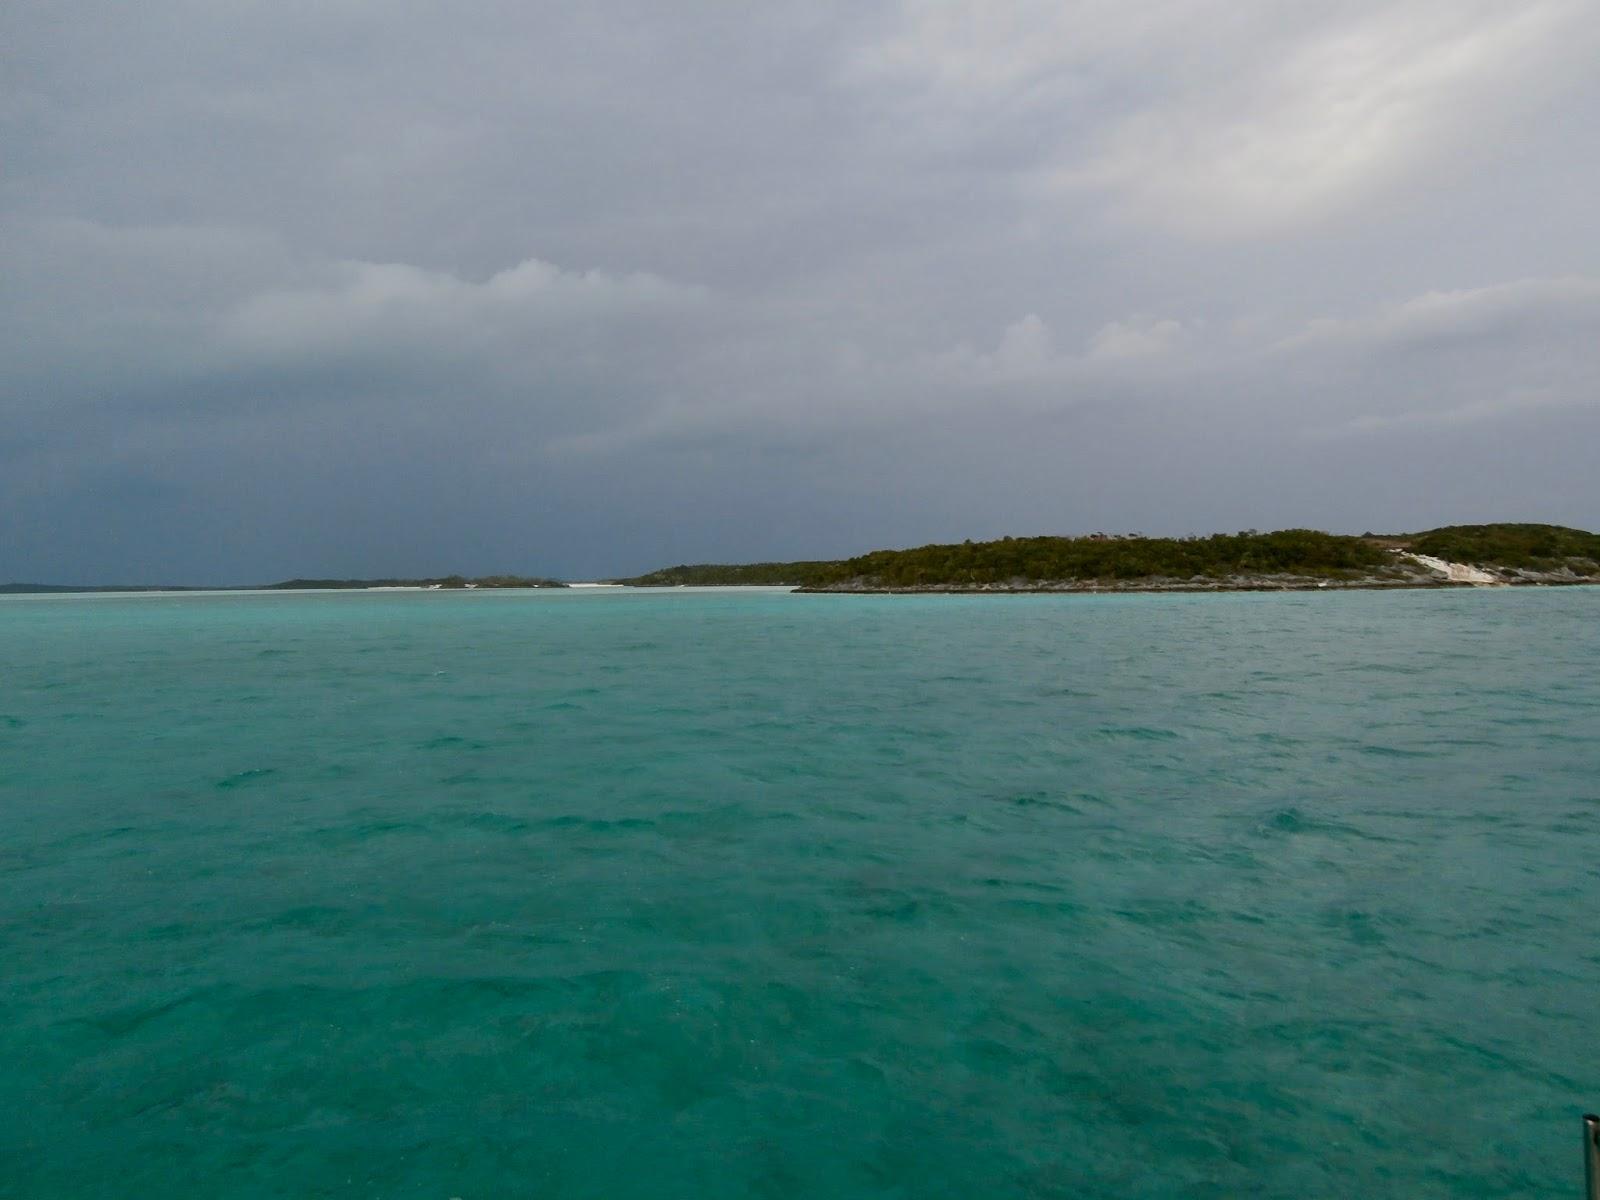 Norman's Cay | The Odyssey of Minke